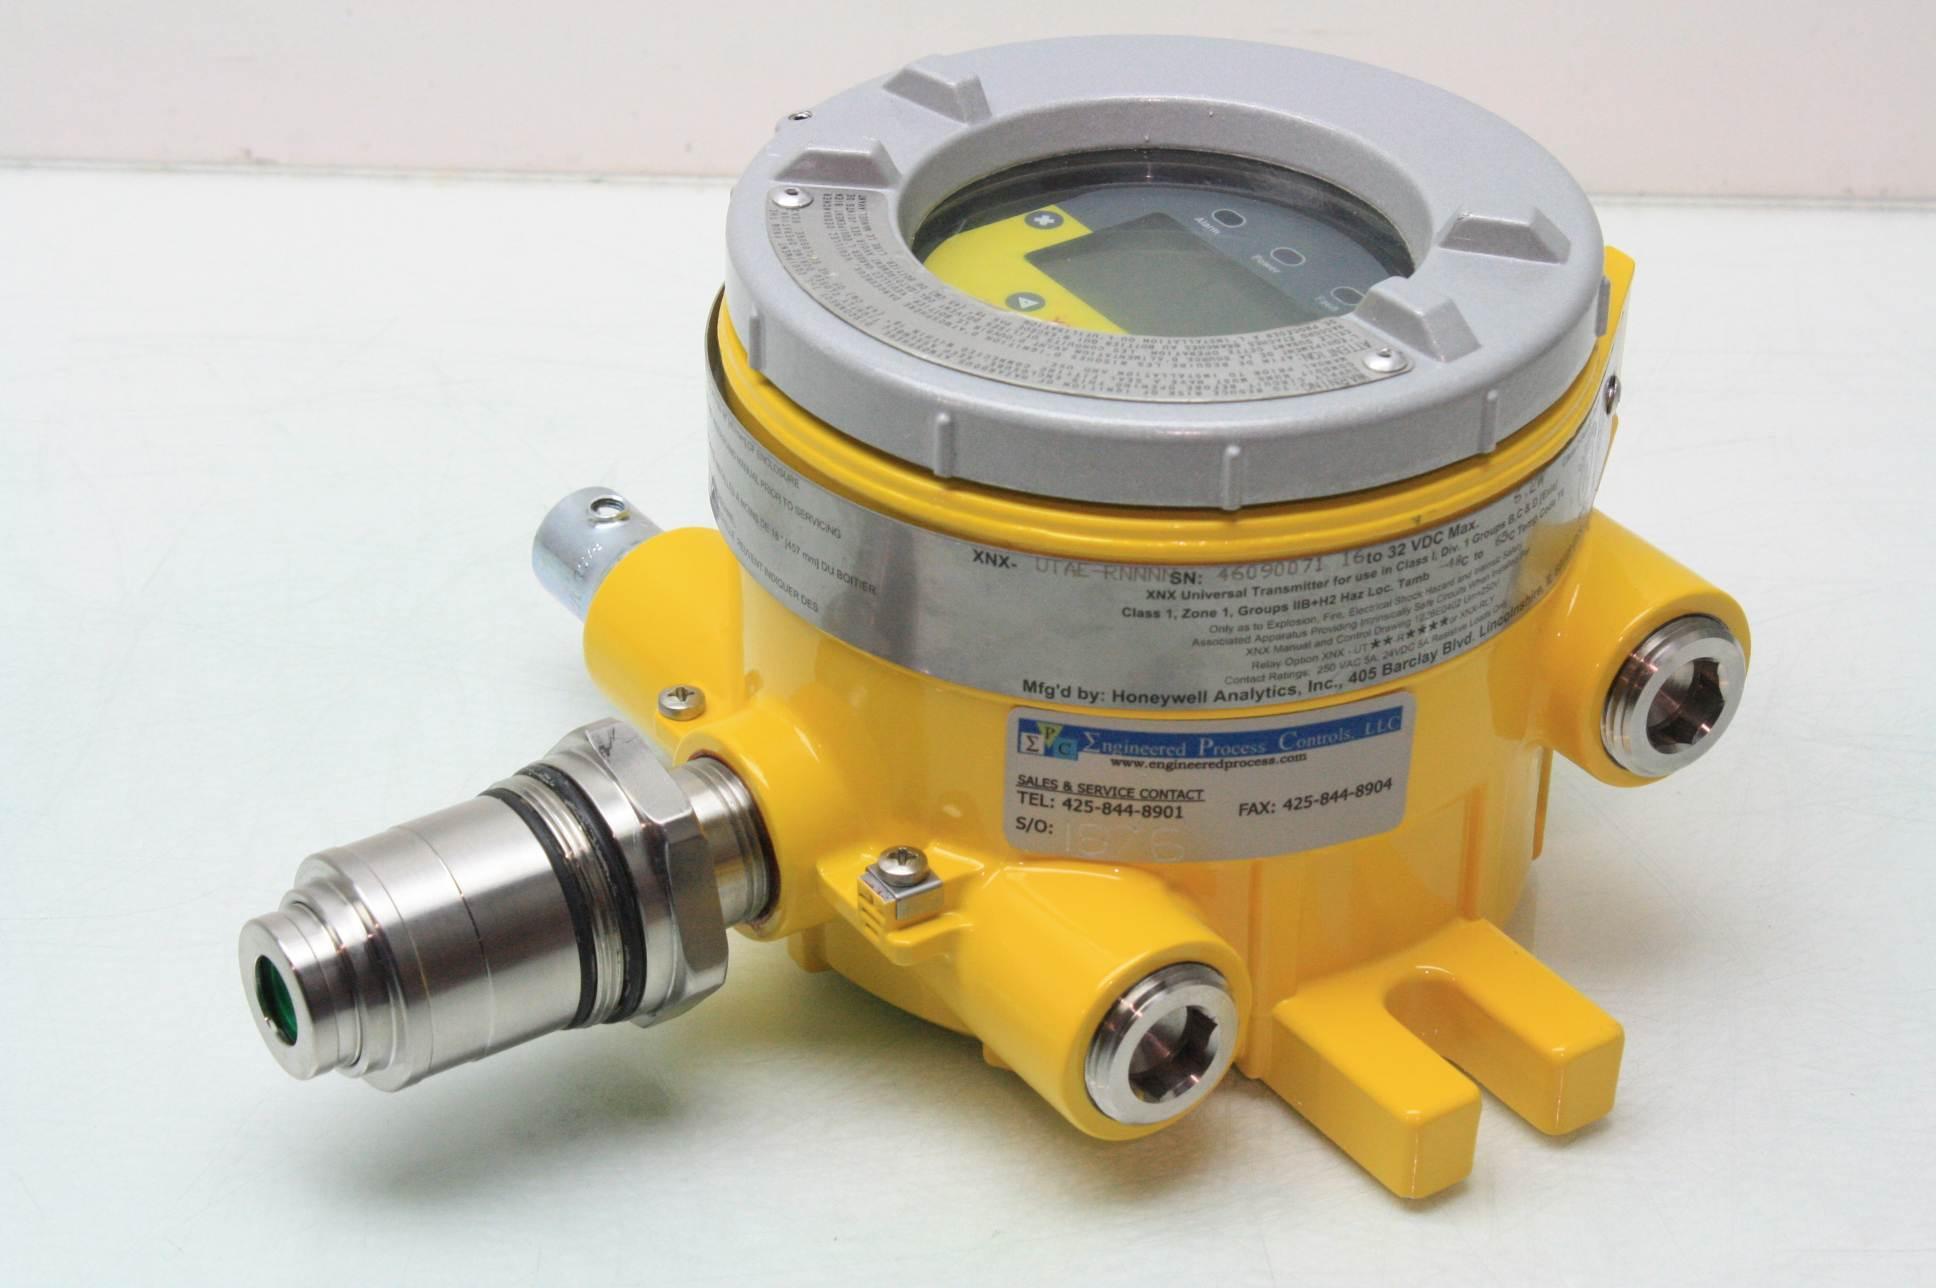 Honeywell universal transmitter xnx utae rnnnn gas detector explosion proof co